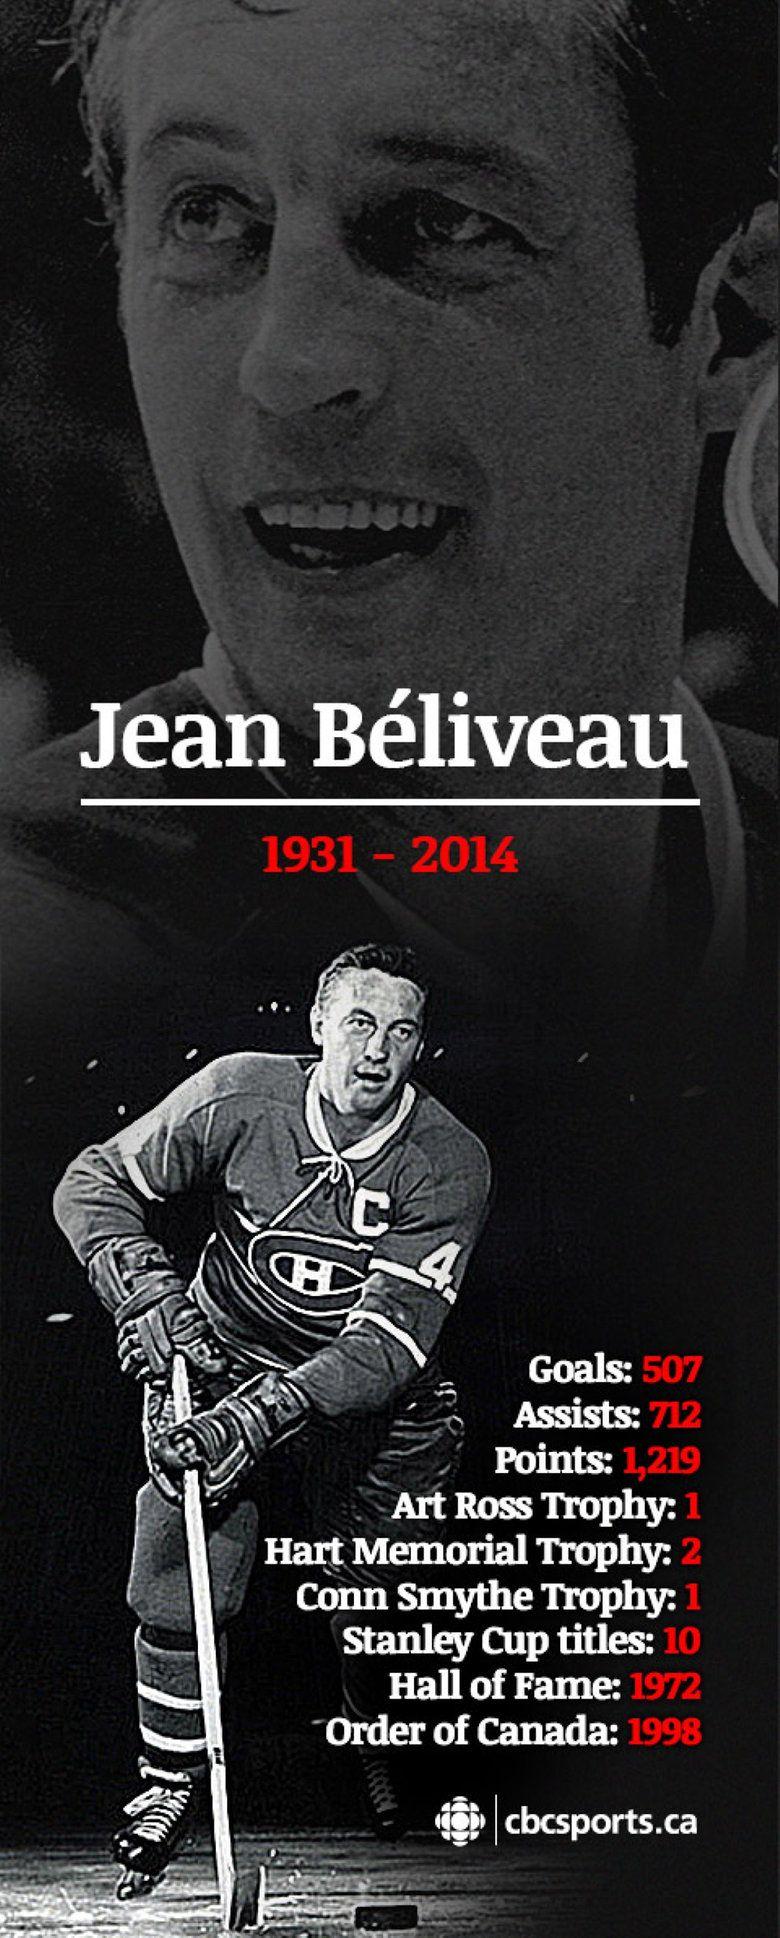 Jean Béliveau His career in numbers Montreal canadiens